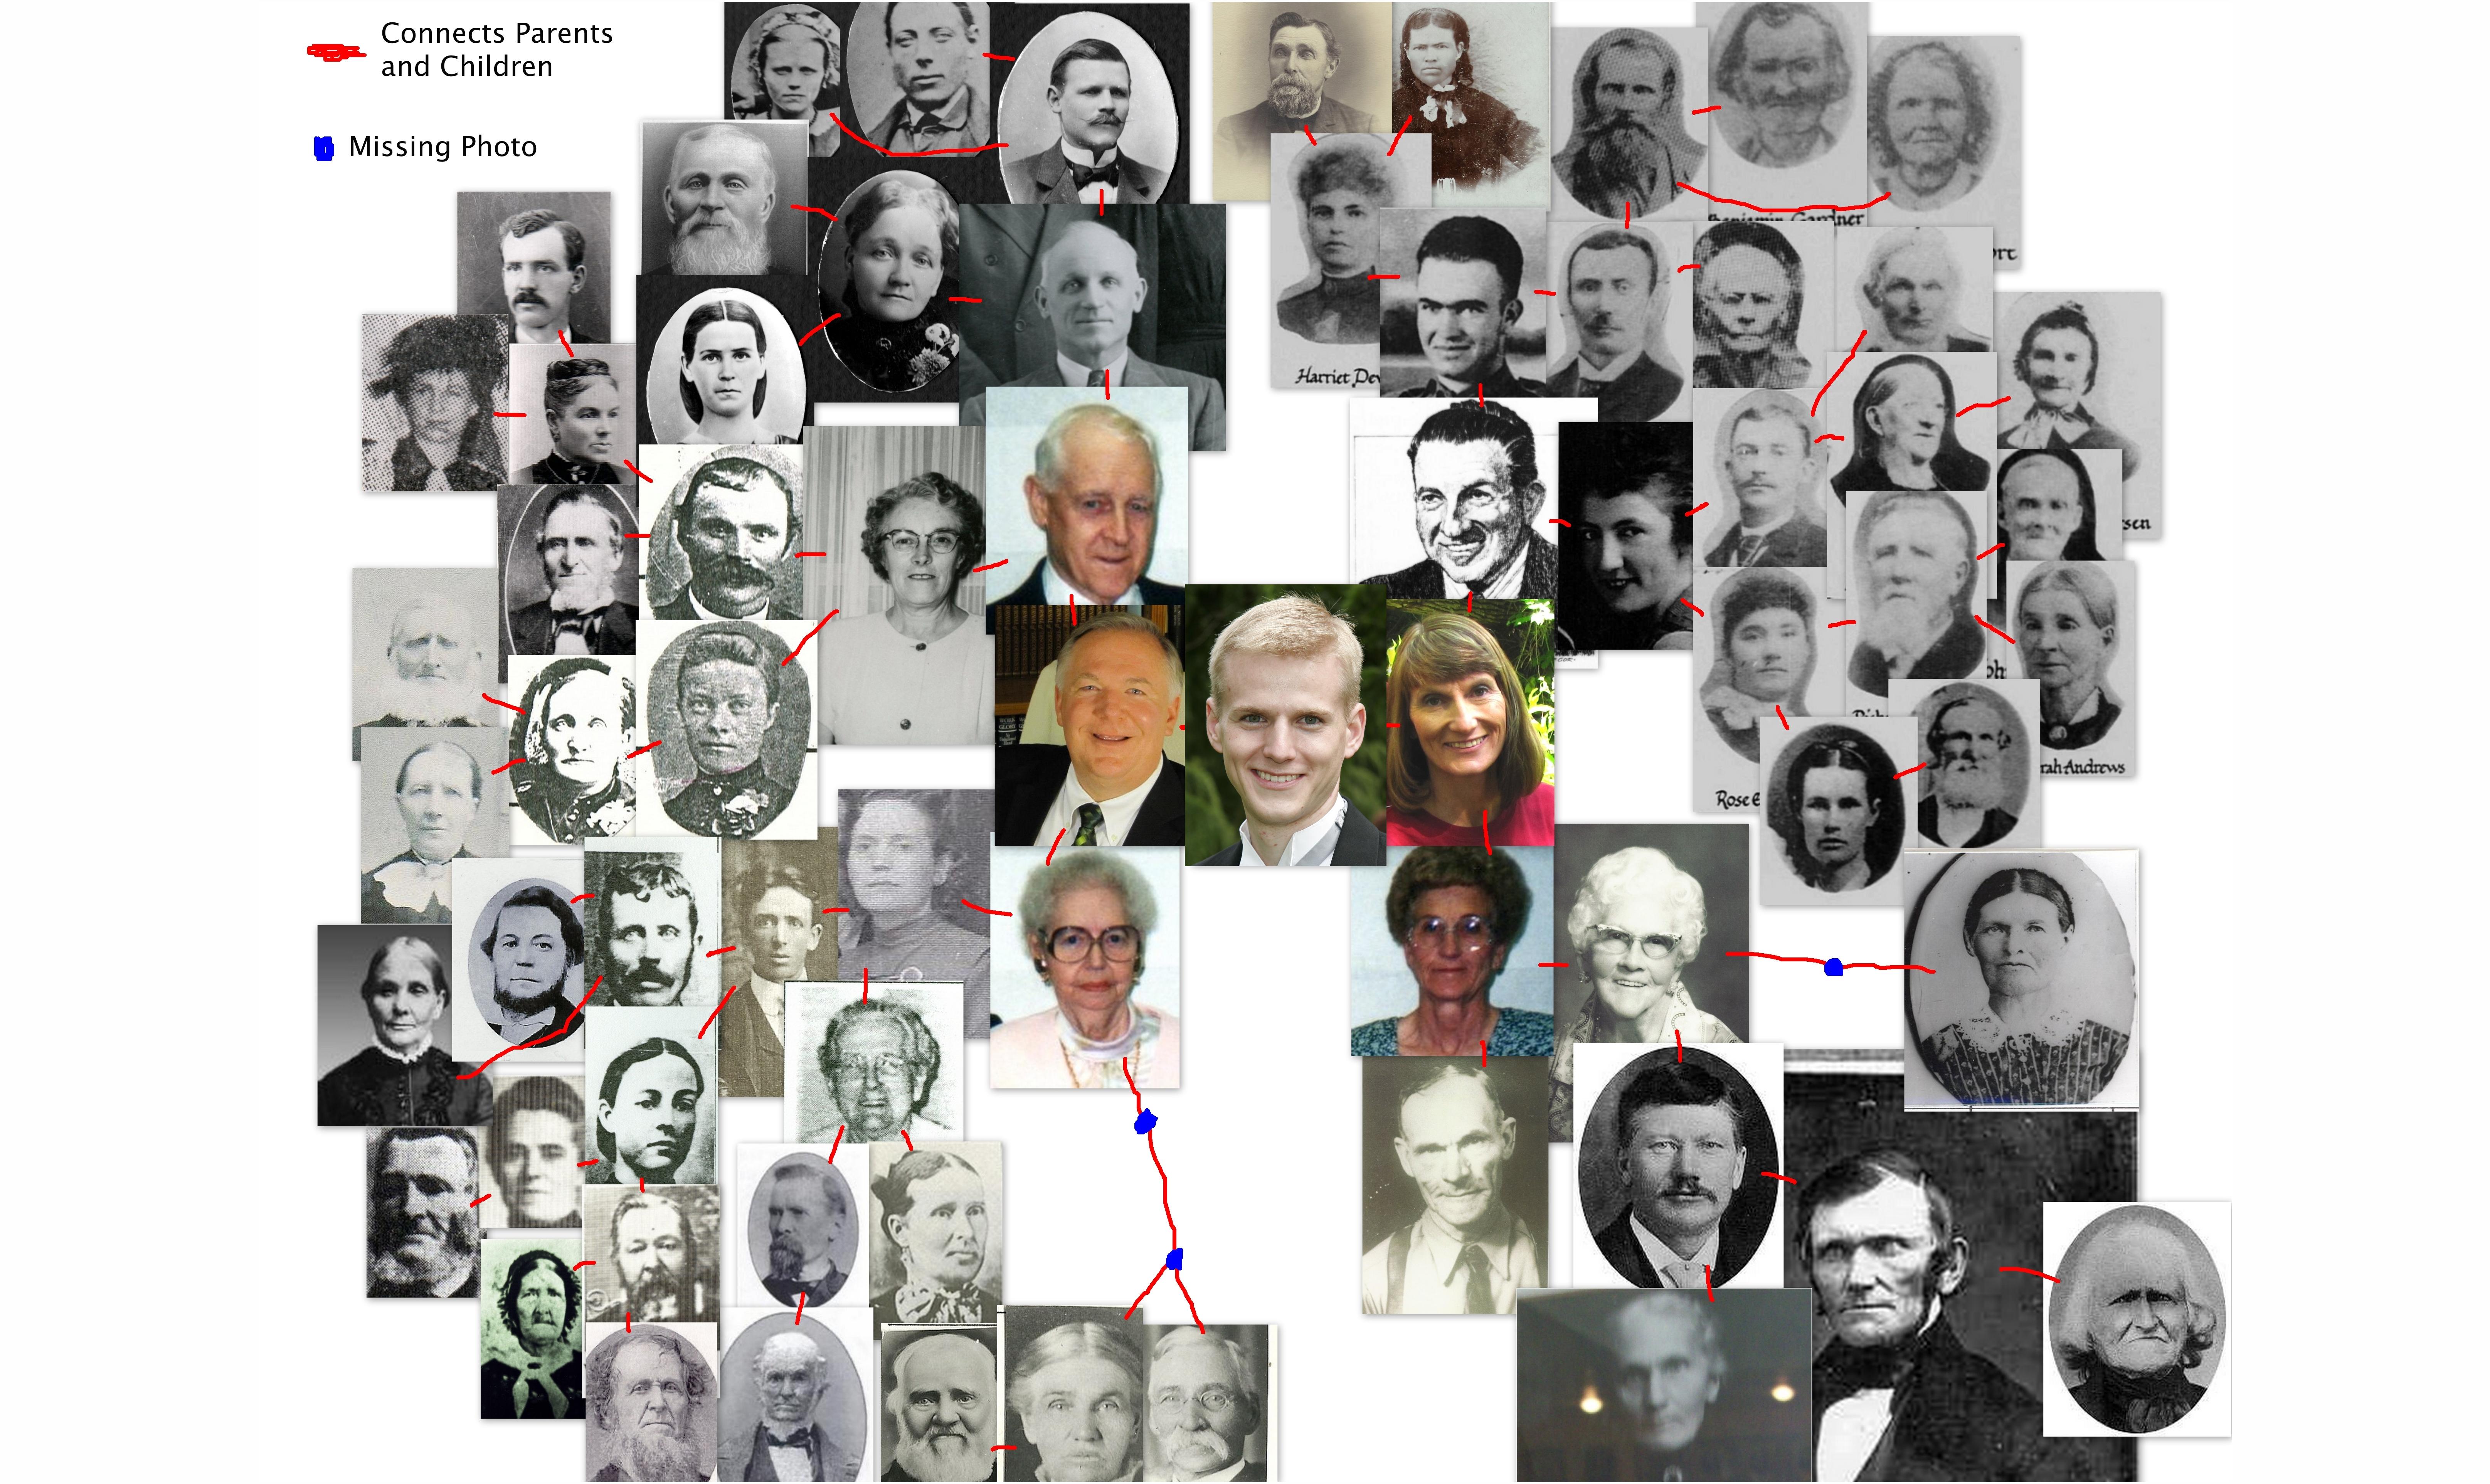 21st Century Family History: Not your grandma's genealogy